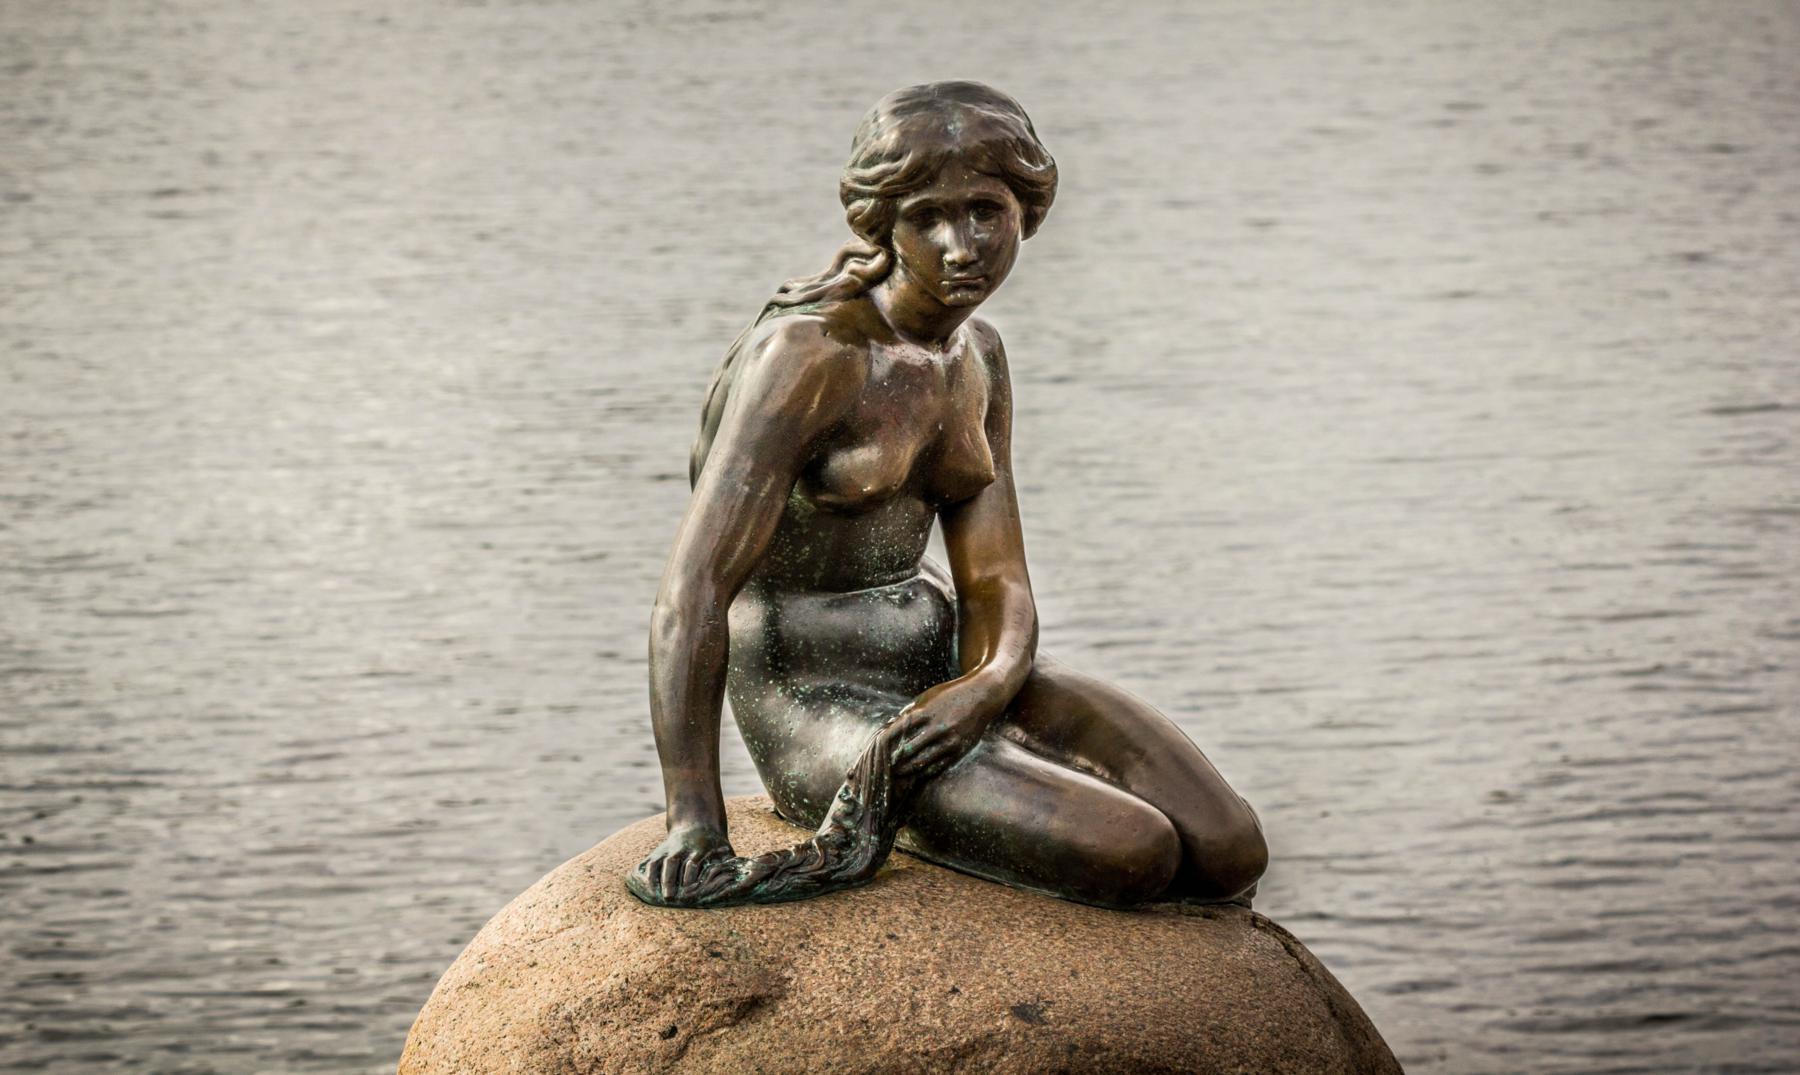 La verdadera historia de la Sirenita de Copenhague